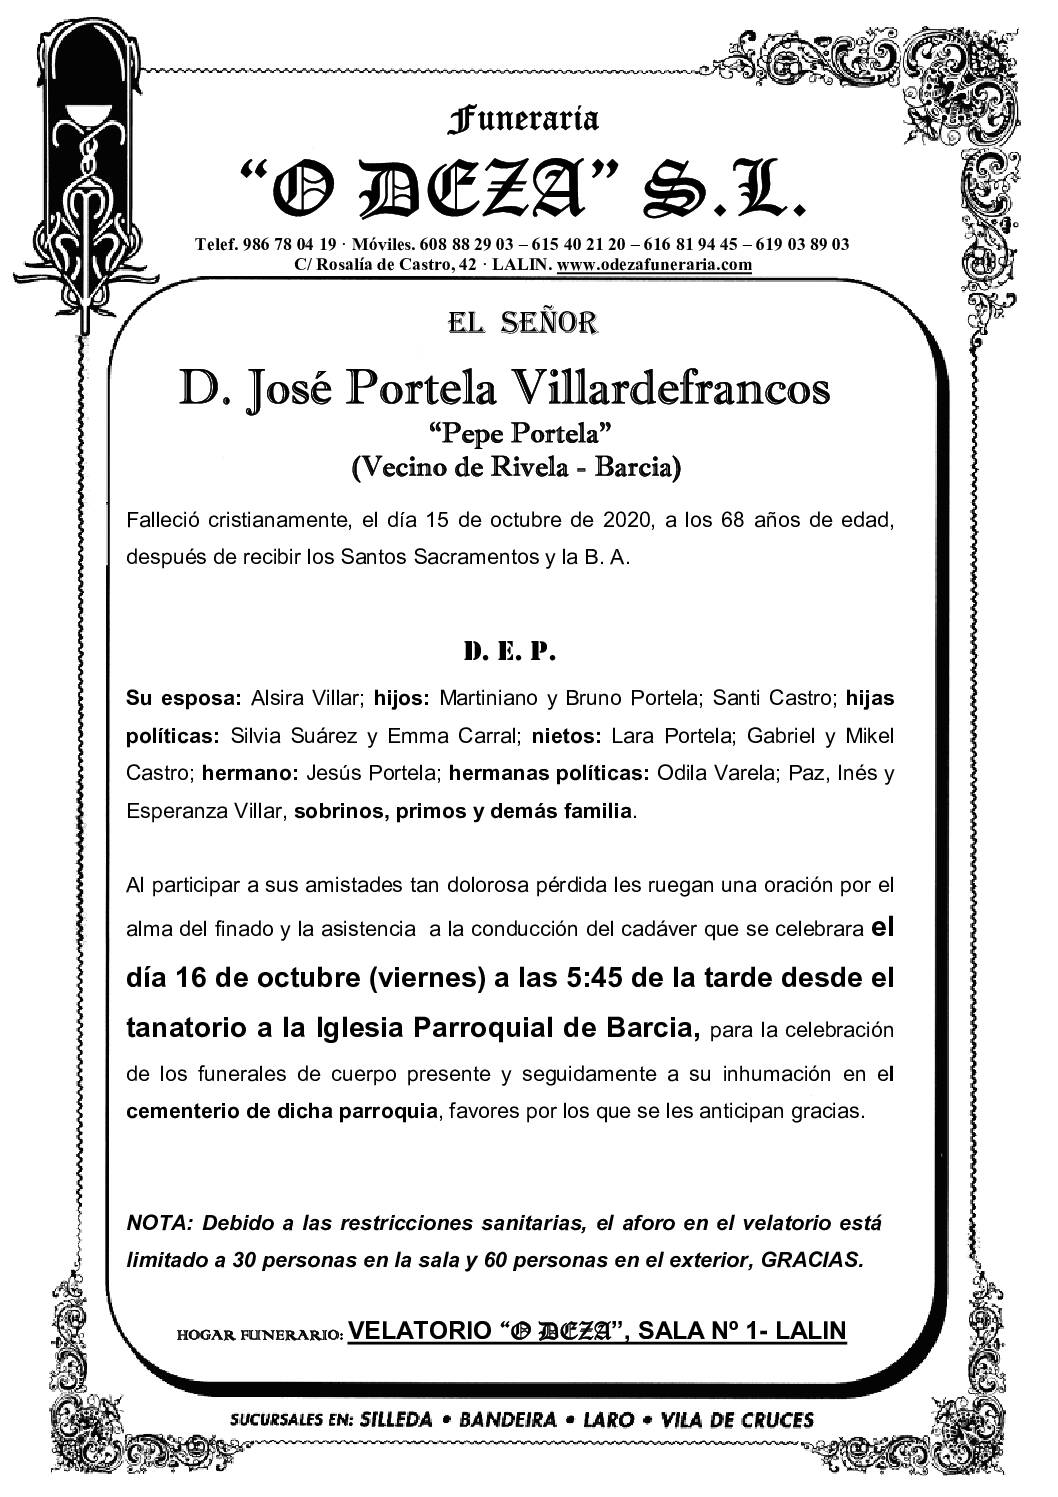 D. JOSÉ PORTELA VILLARDEFRANCO